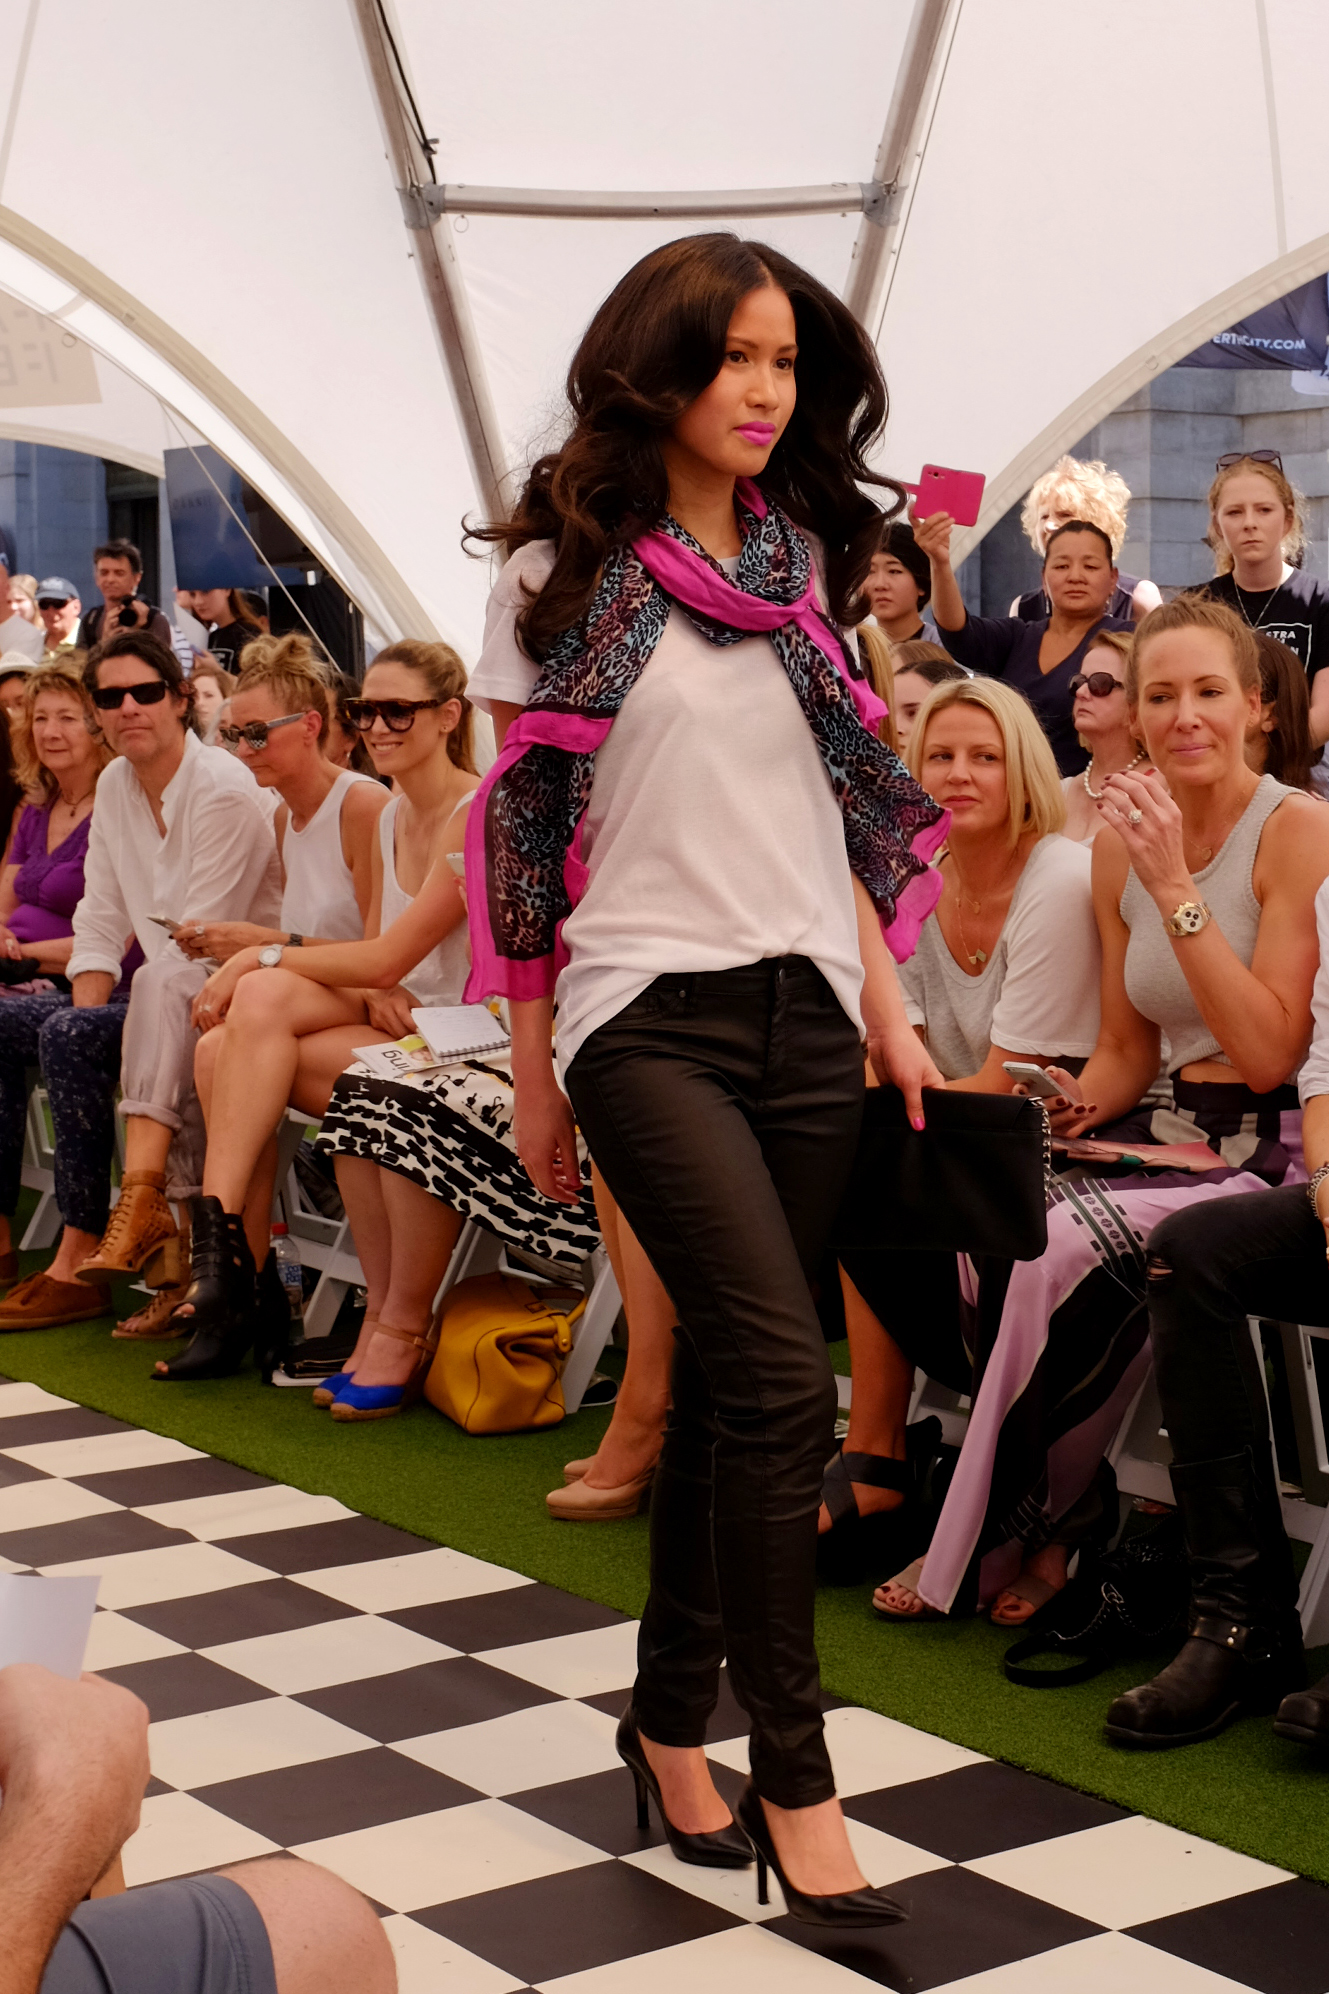 target, runway, TPFF, fashion, perth fashion, dannii minogue, Samantha Jade, singer, artist, models, sunglasses, style, cute, affordable, shopping, runway to rack, spring racing, nezuki, petite clothing, petite sizes, facinator